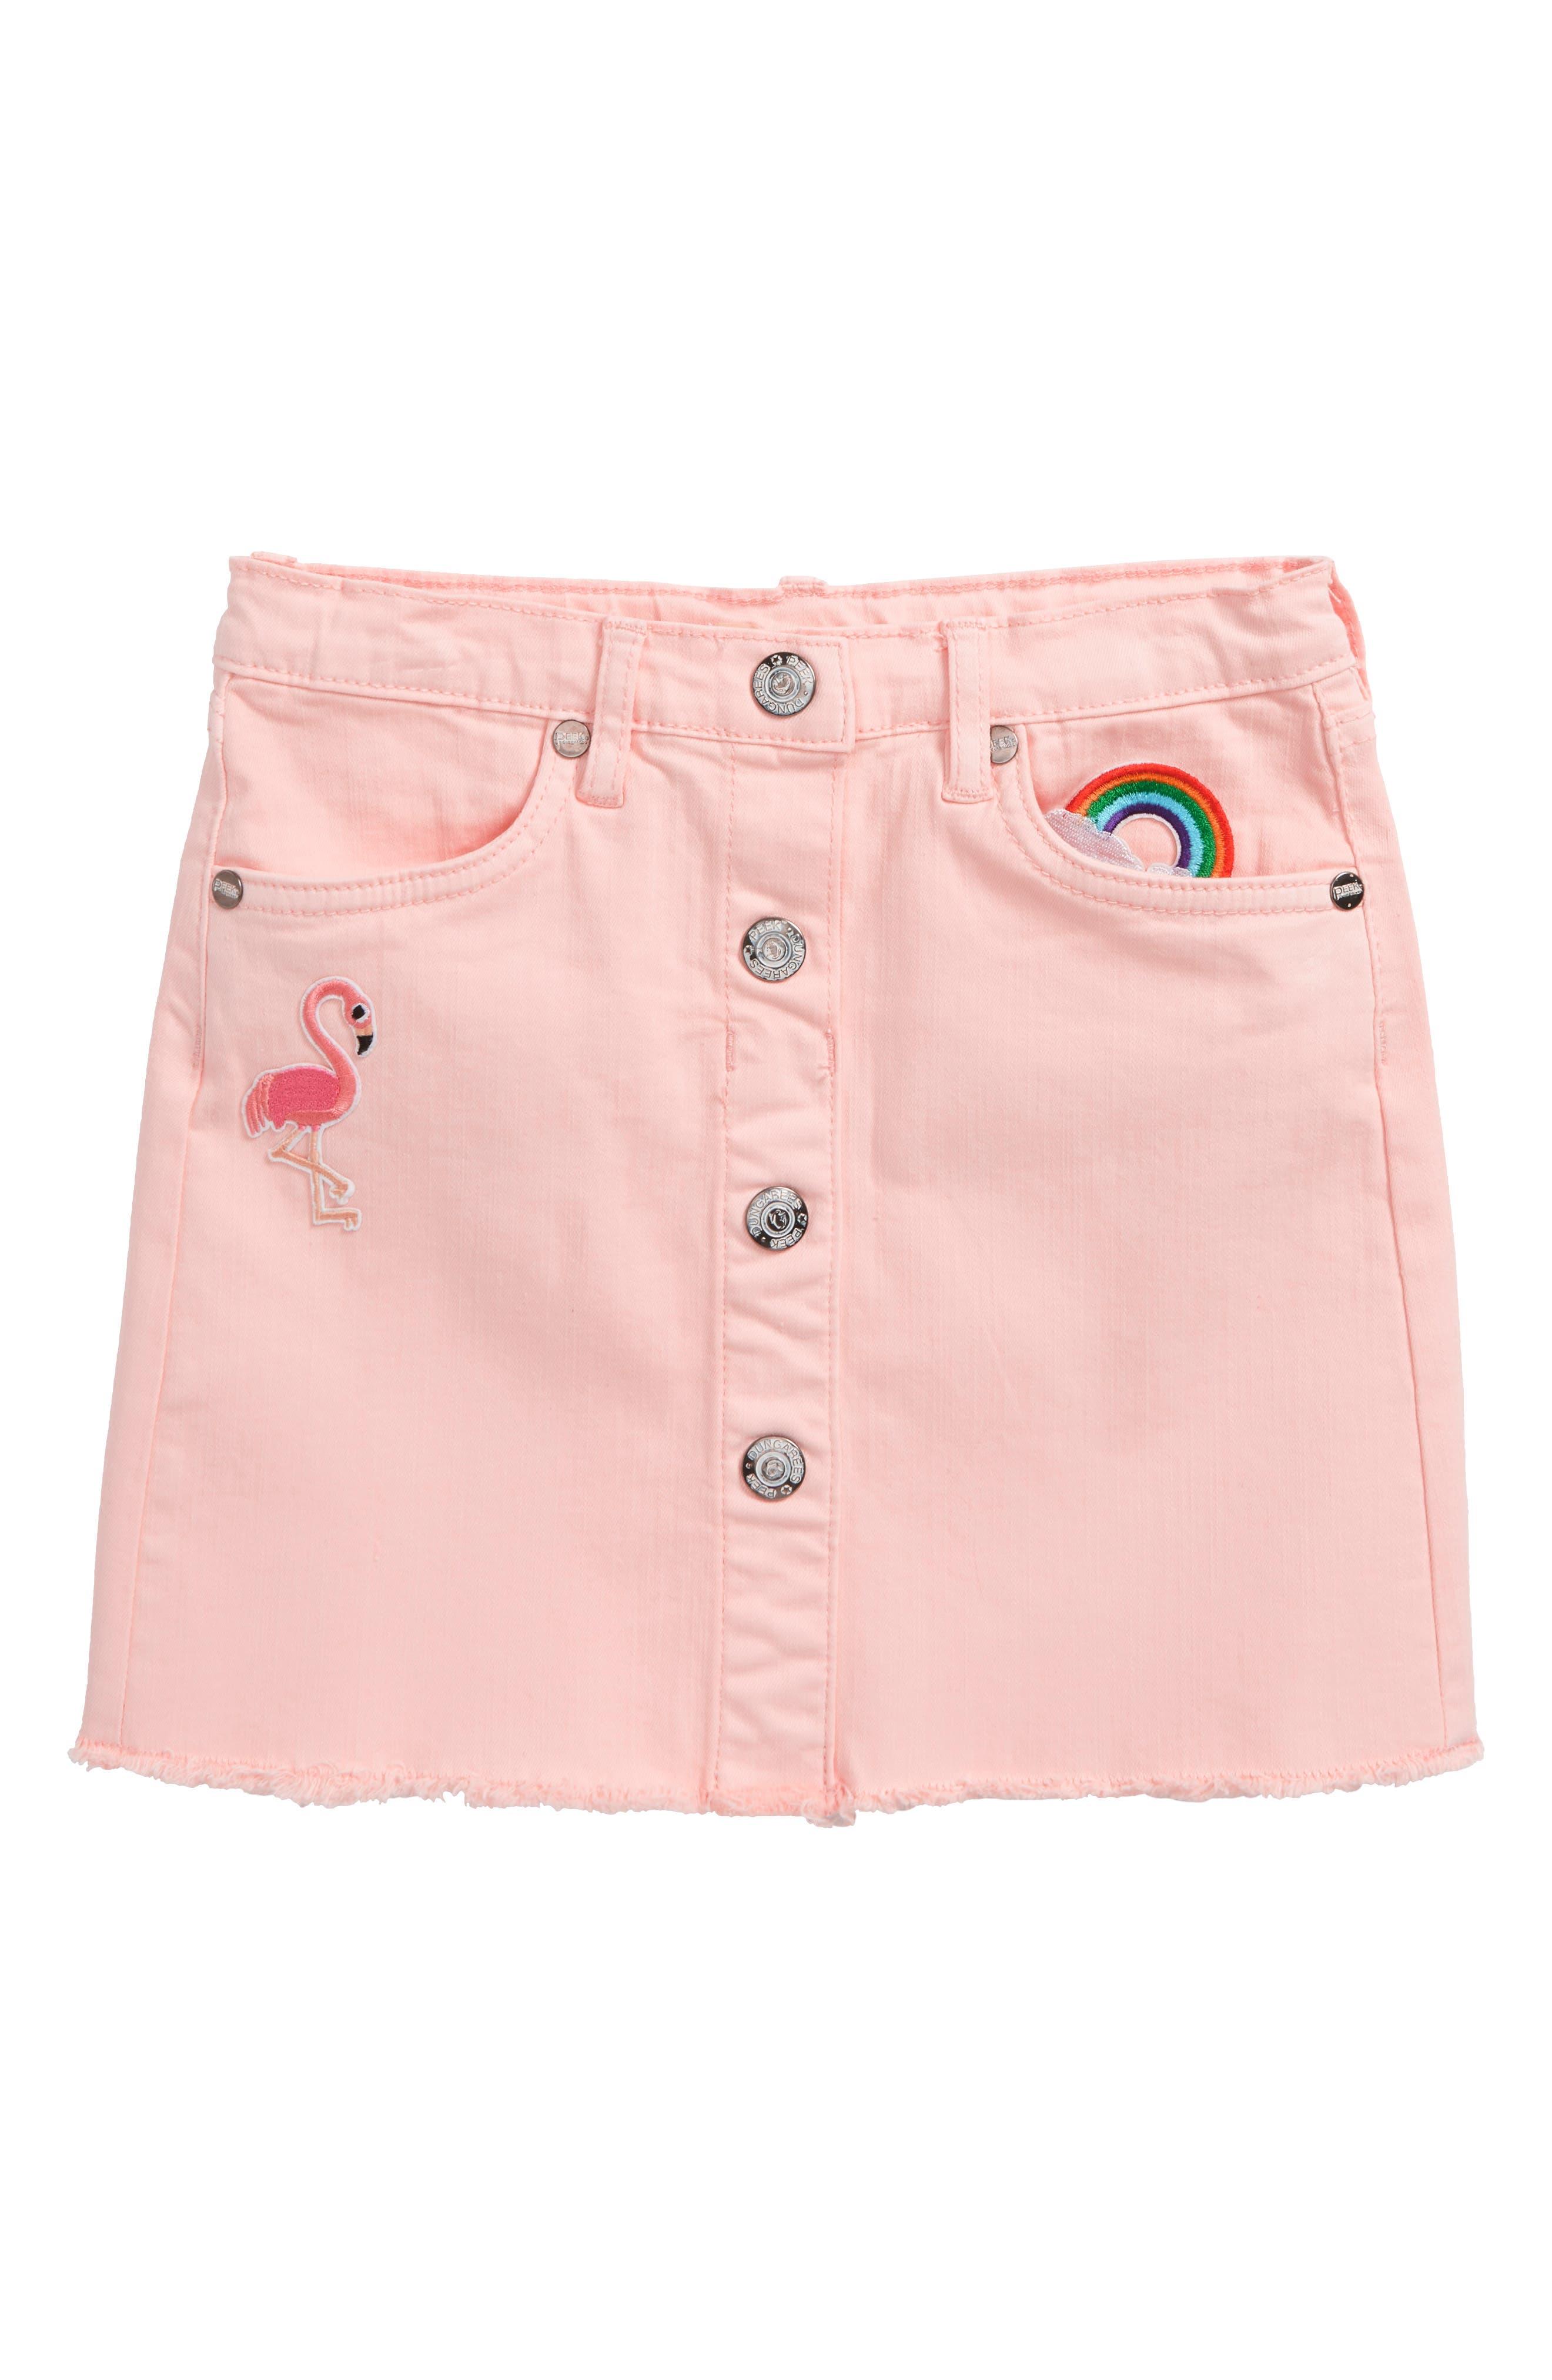 Flamingo Denim Skirt,                             Main thumbnail 1, color,                             Pink